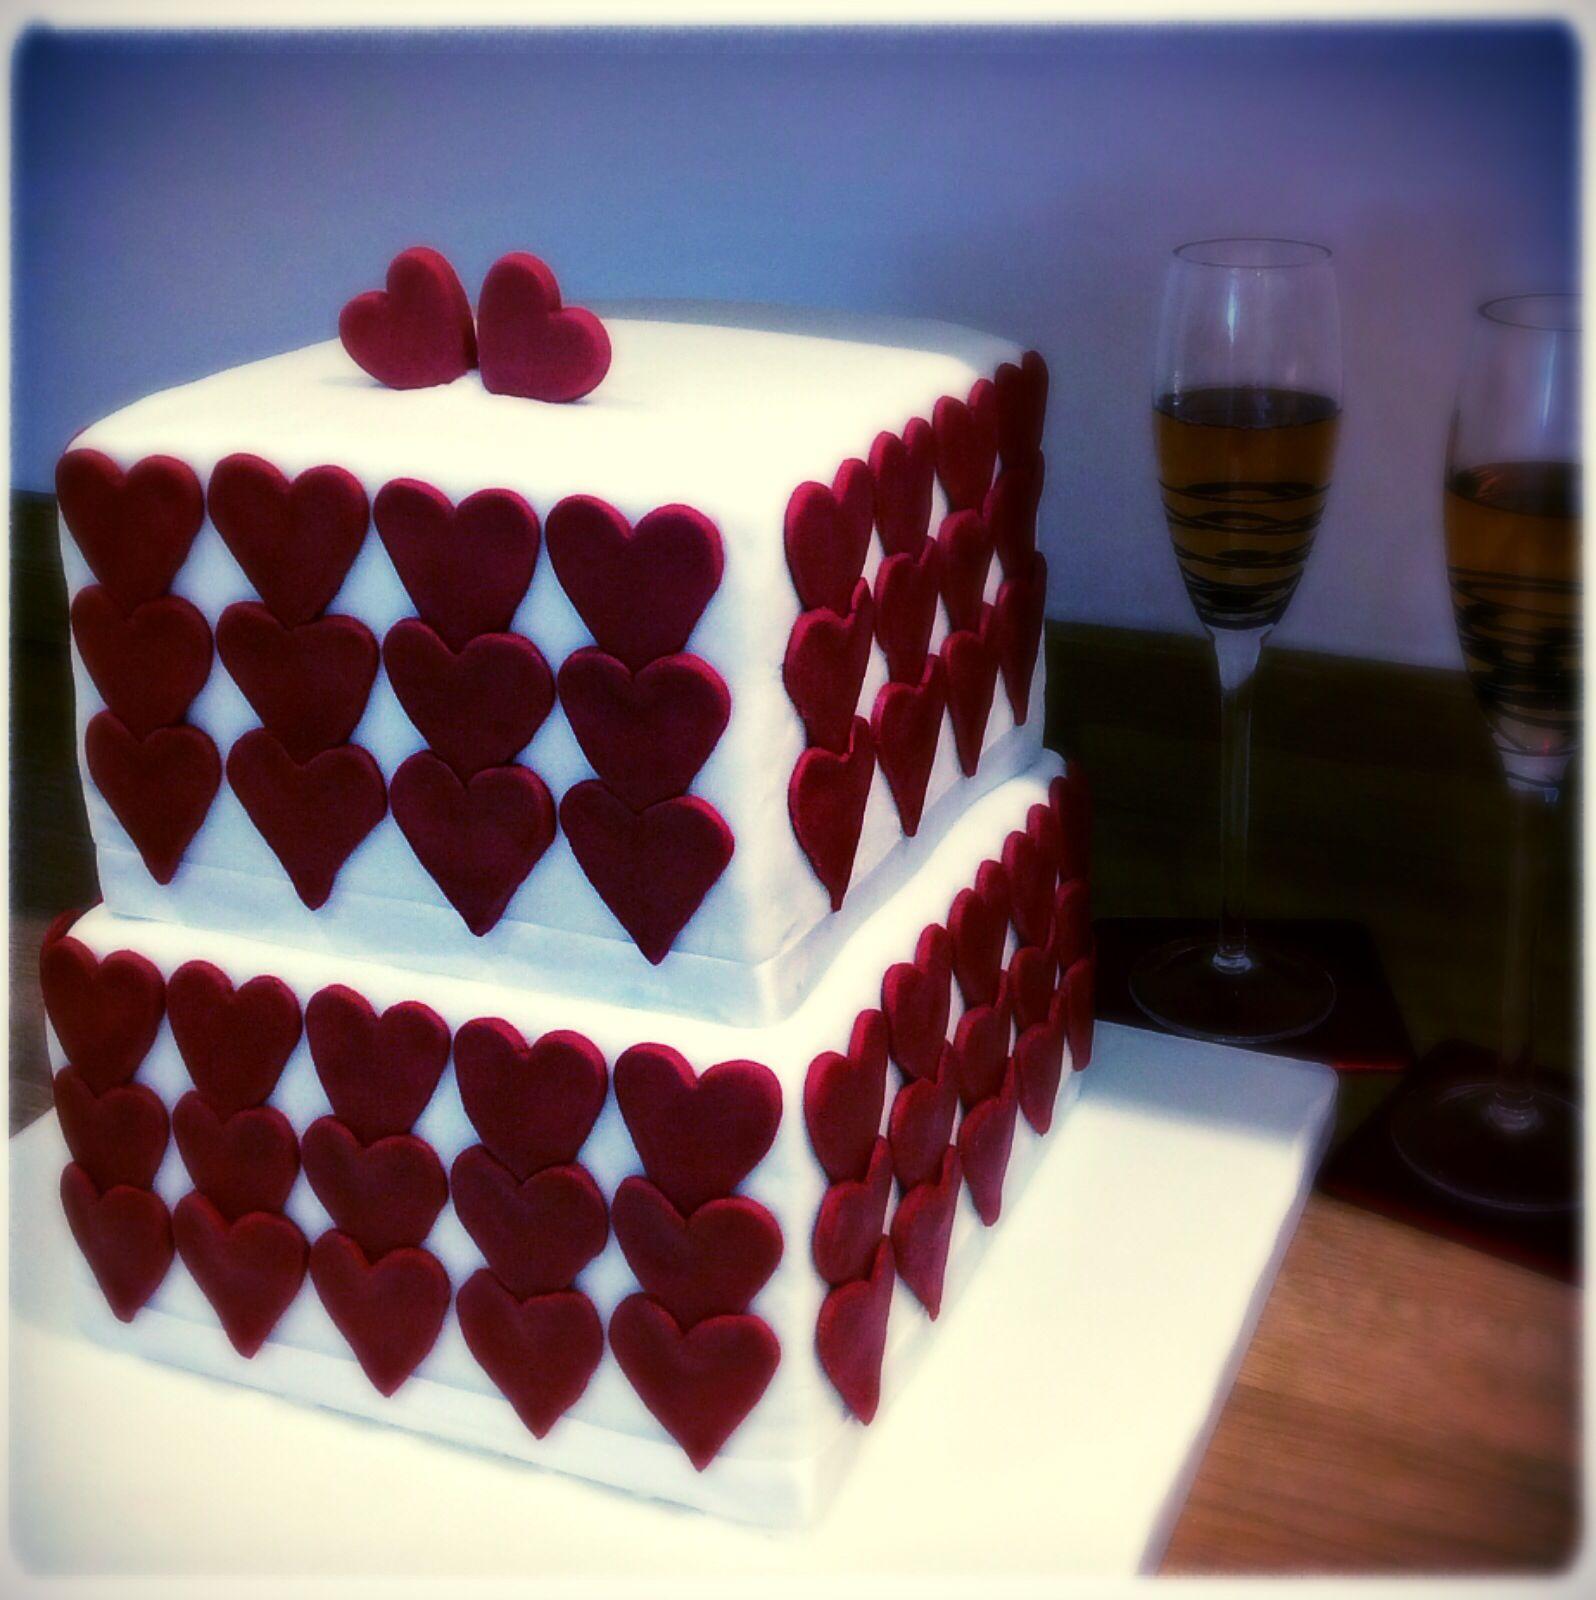 Decoration ideas for 40th wedding anniversary  Pin by ekeezGirl  on YuuuuuMMiEz  Pinterest  Cake Wedding